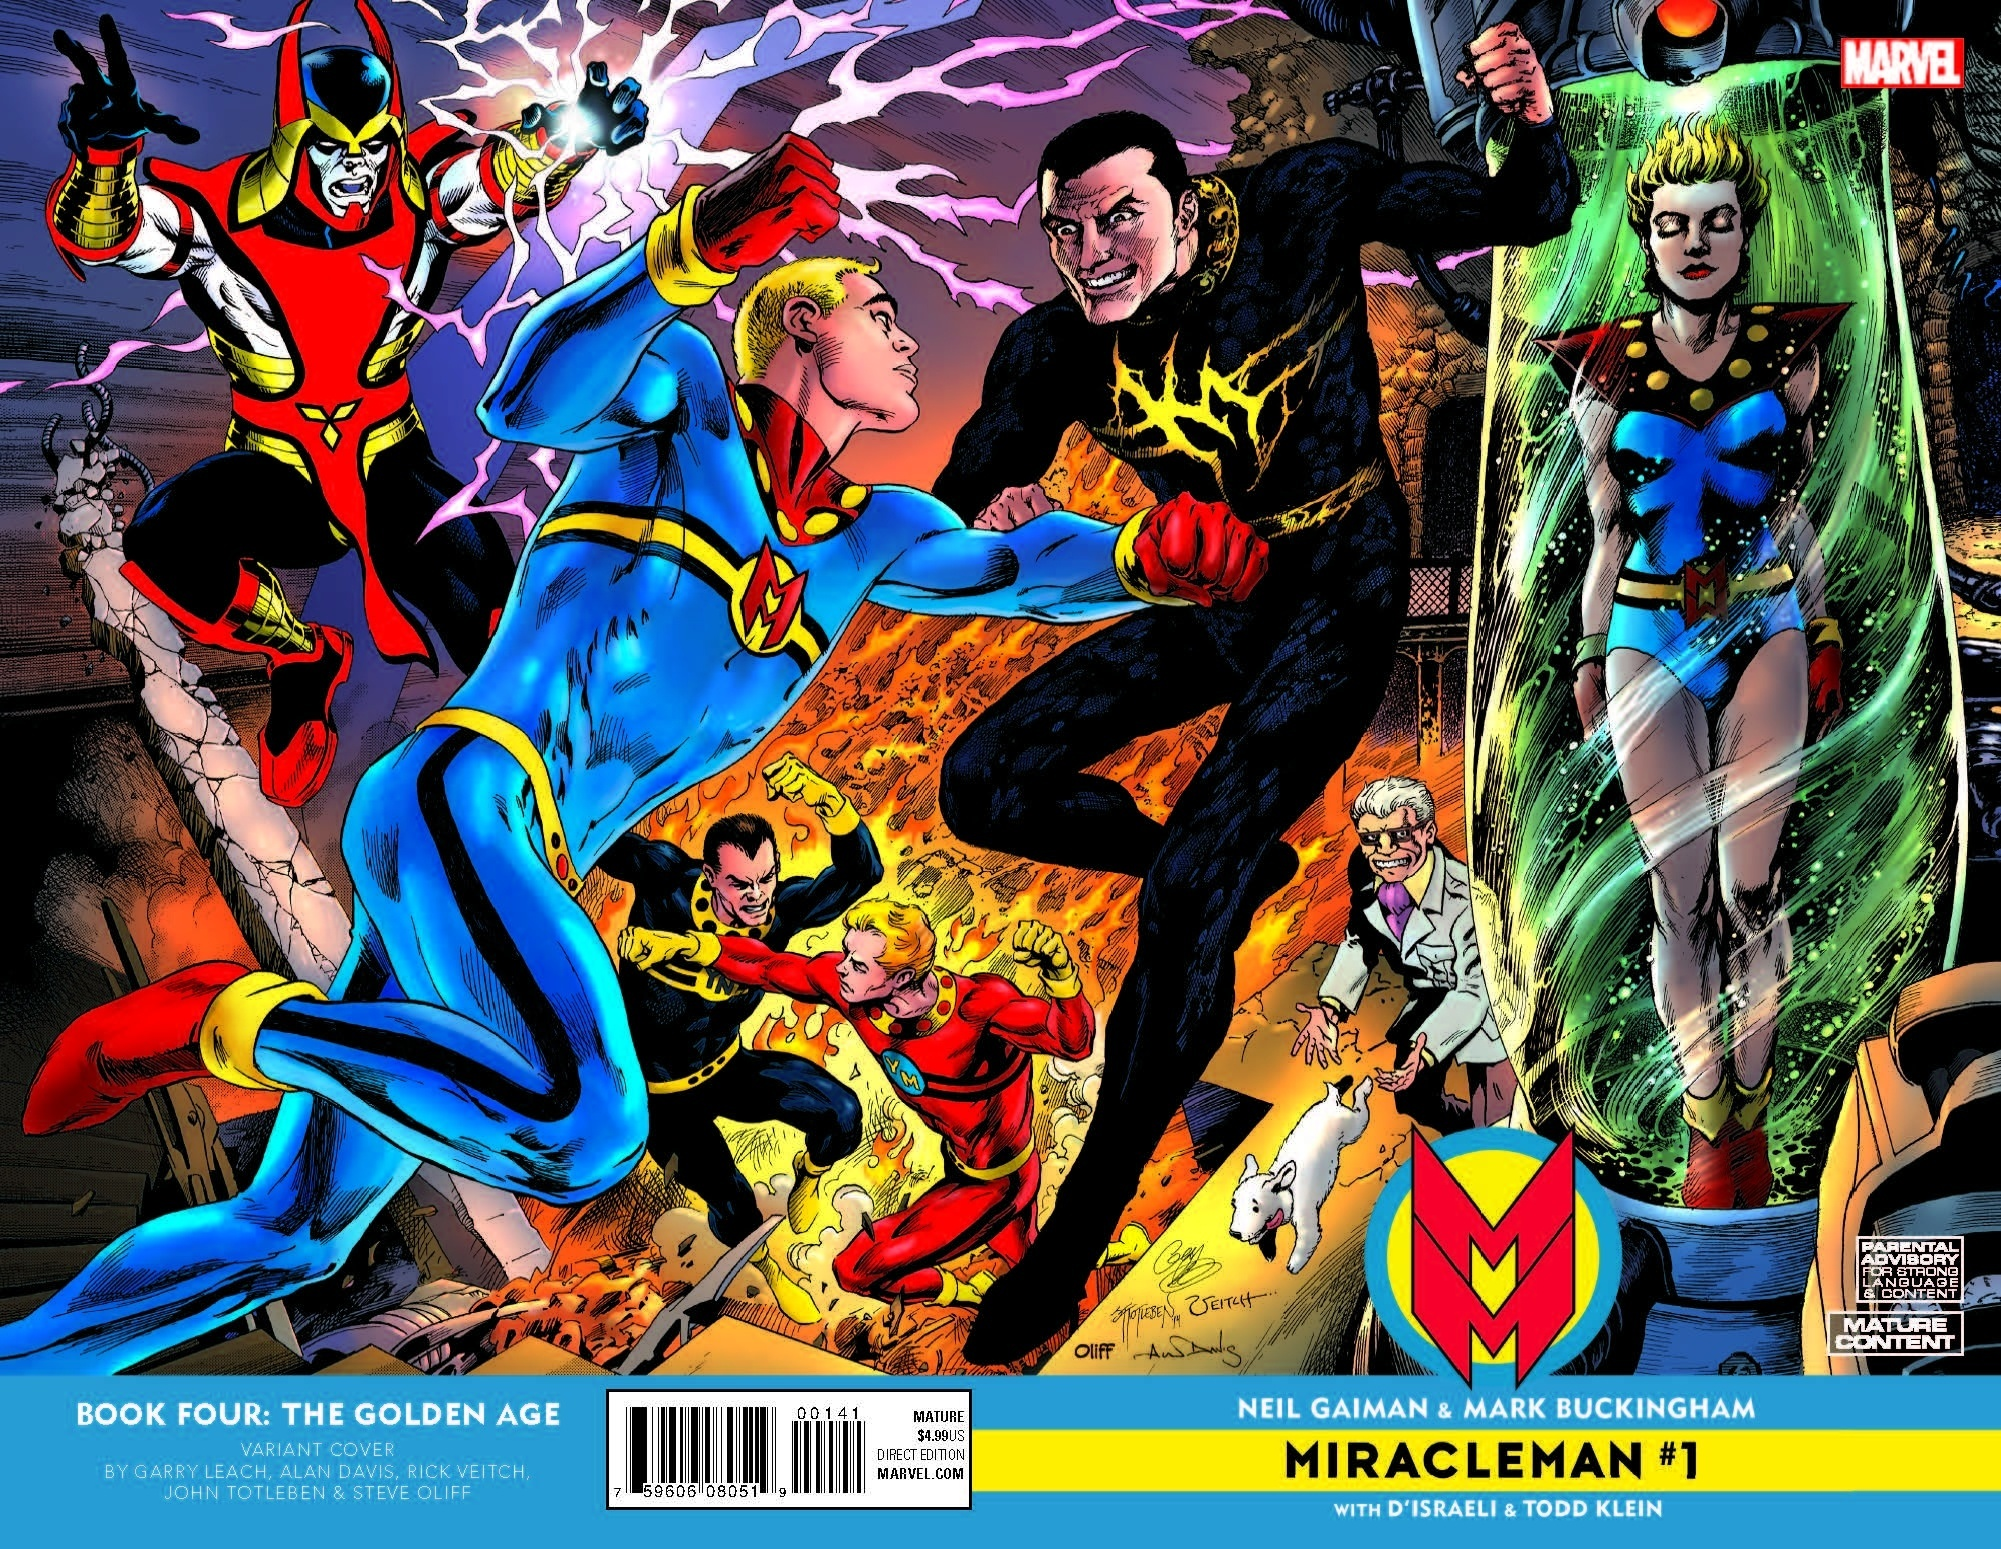 Miracleman #1 Volume 2 variant cover by Garry Leach, Alan Davis, John Totleben and Rick Veitch